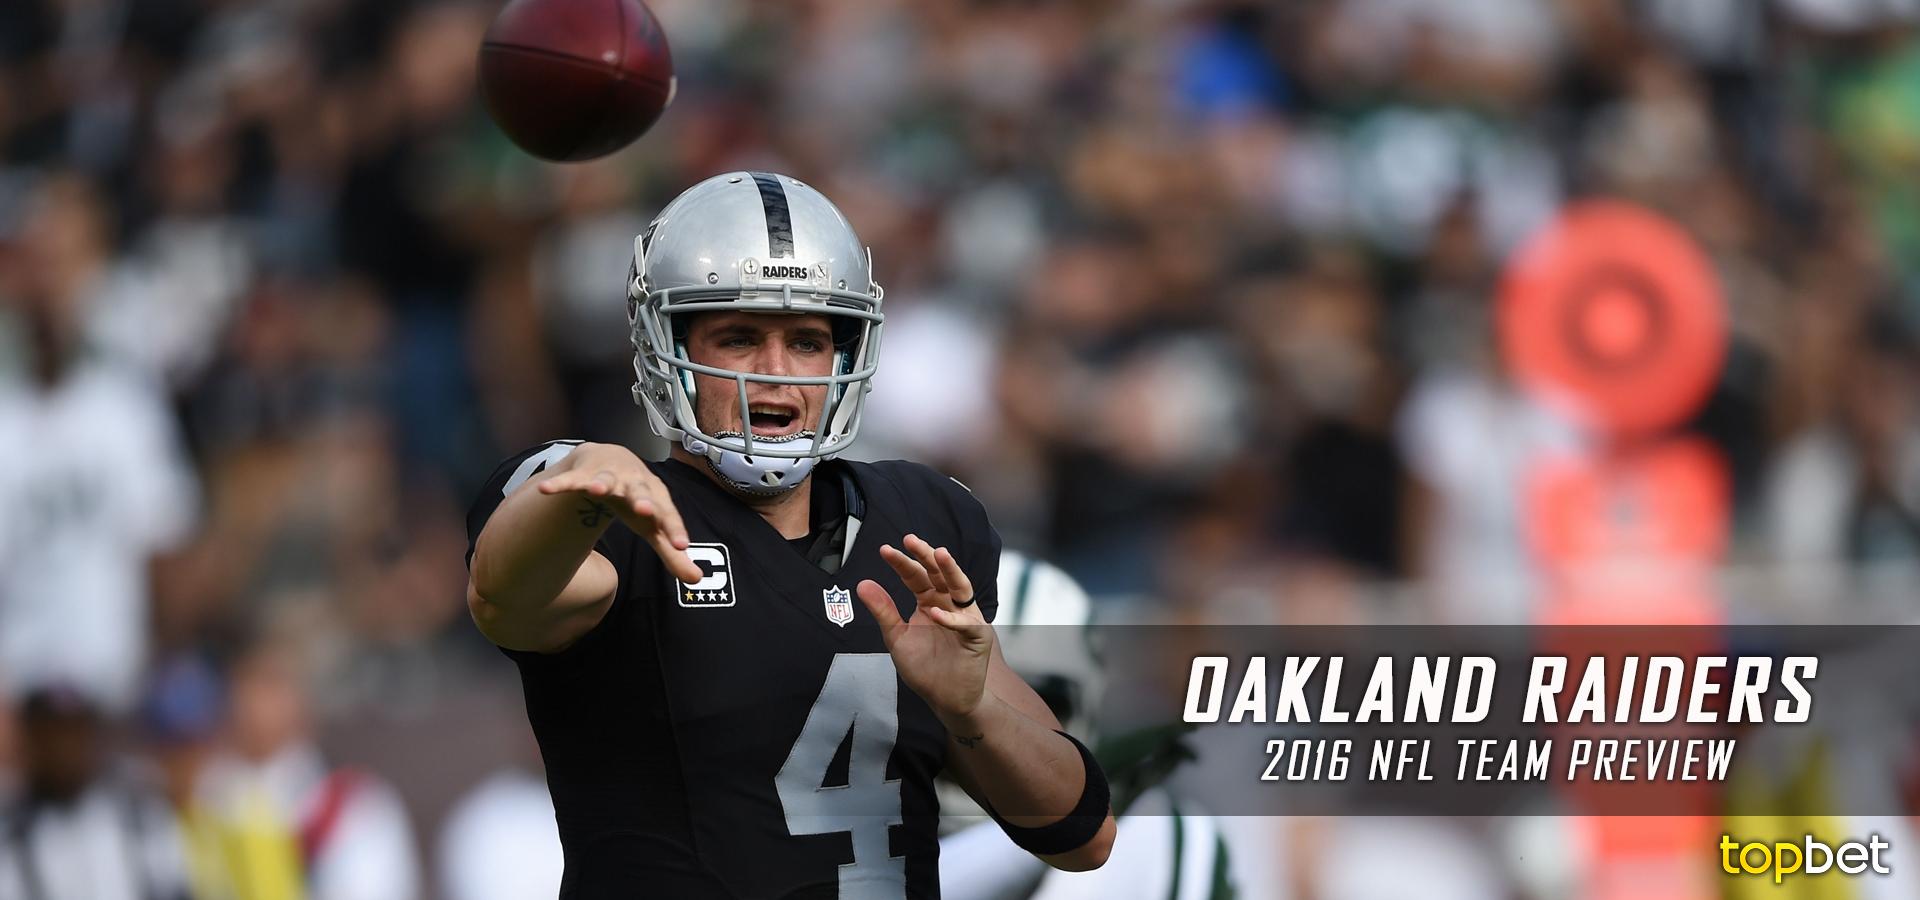 Raiders News 2016